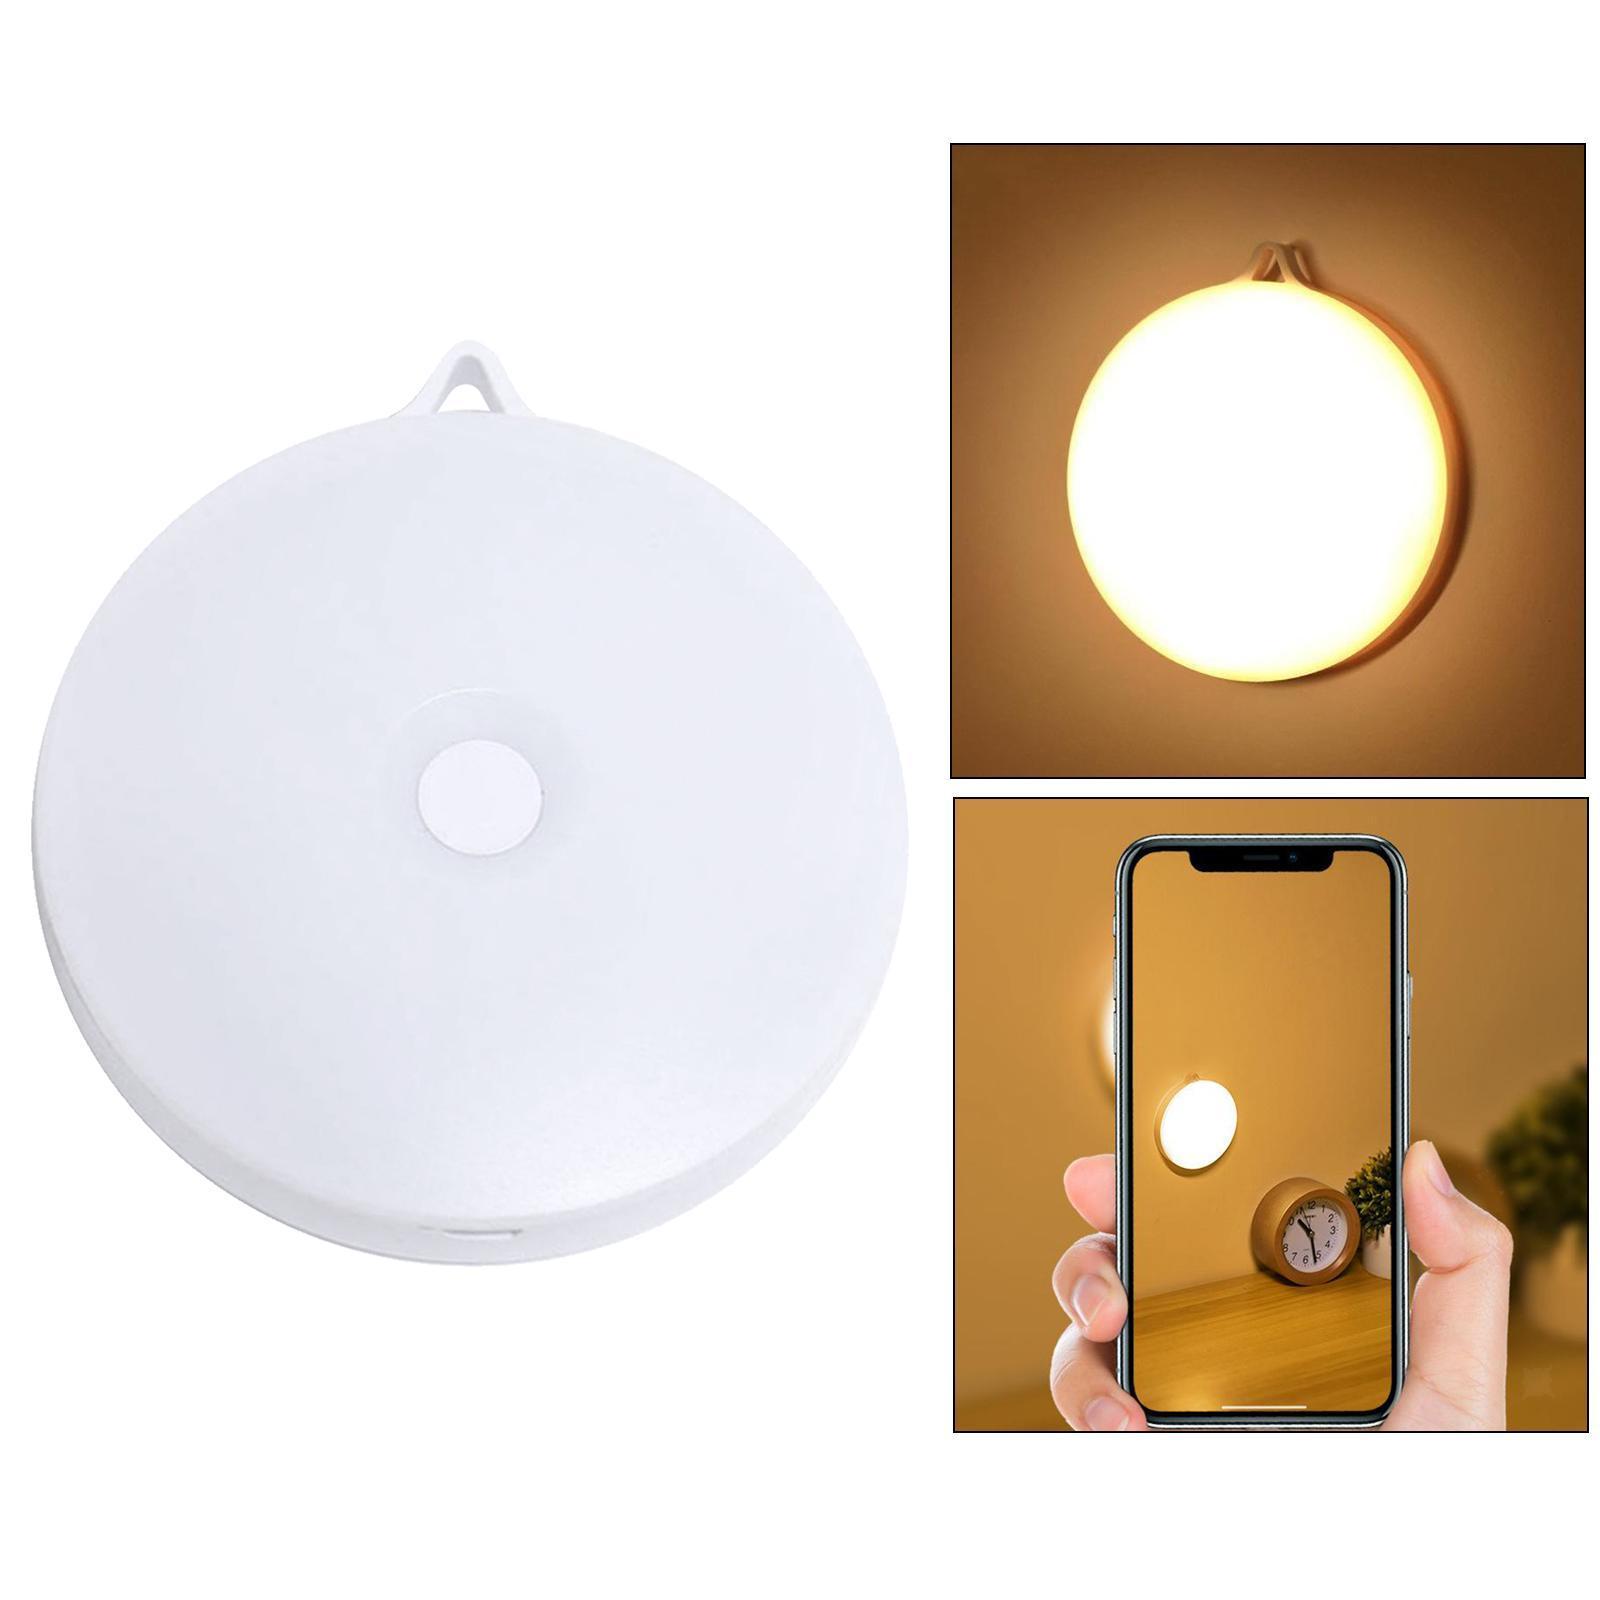 miniatura 11 - Luce notturna a LED per camera da letto ricaricabile USB per Hotel con sensore